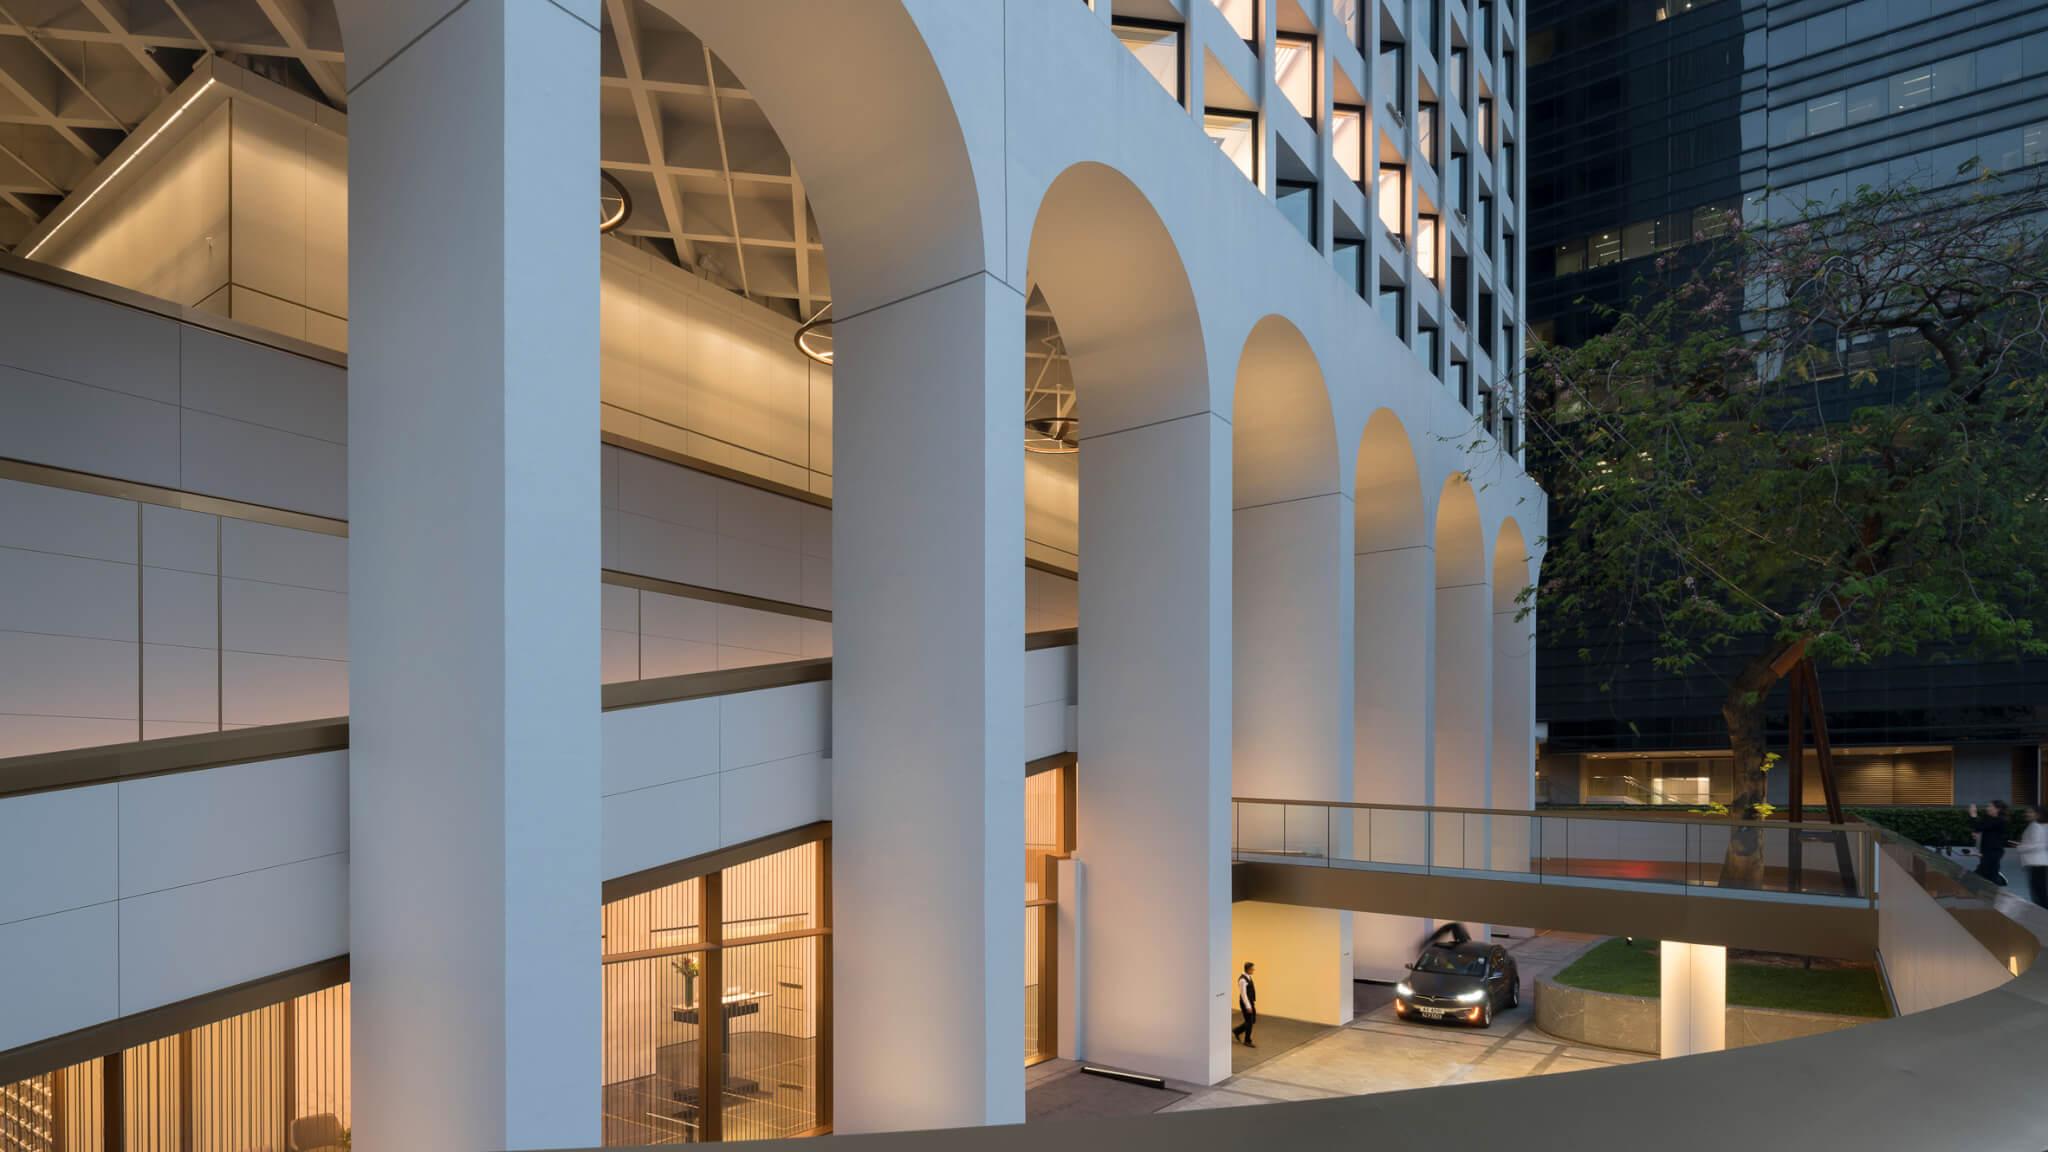 murray-hotel-foster-partners-architecture-news-hong-kong-china_dezeen_hero-1